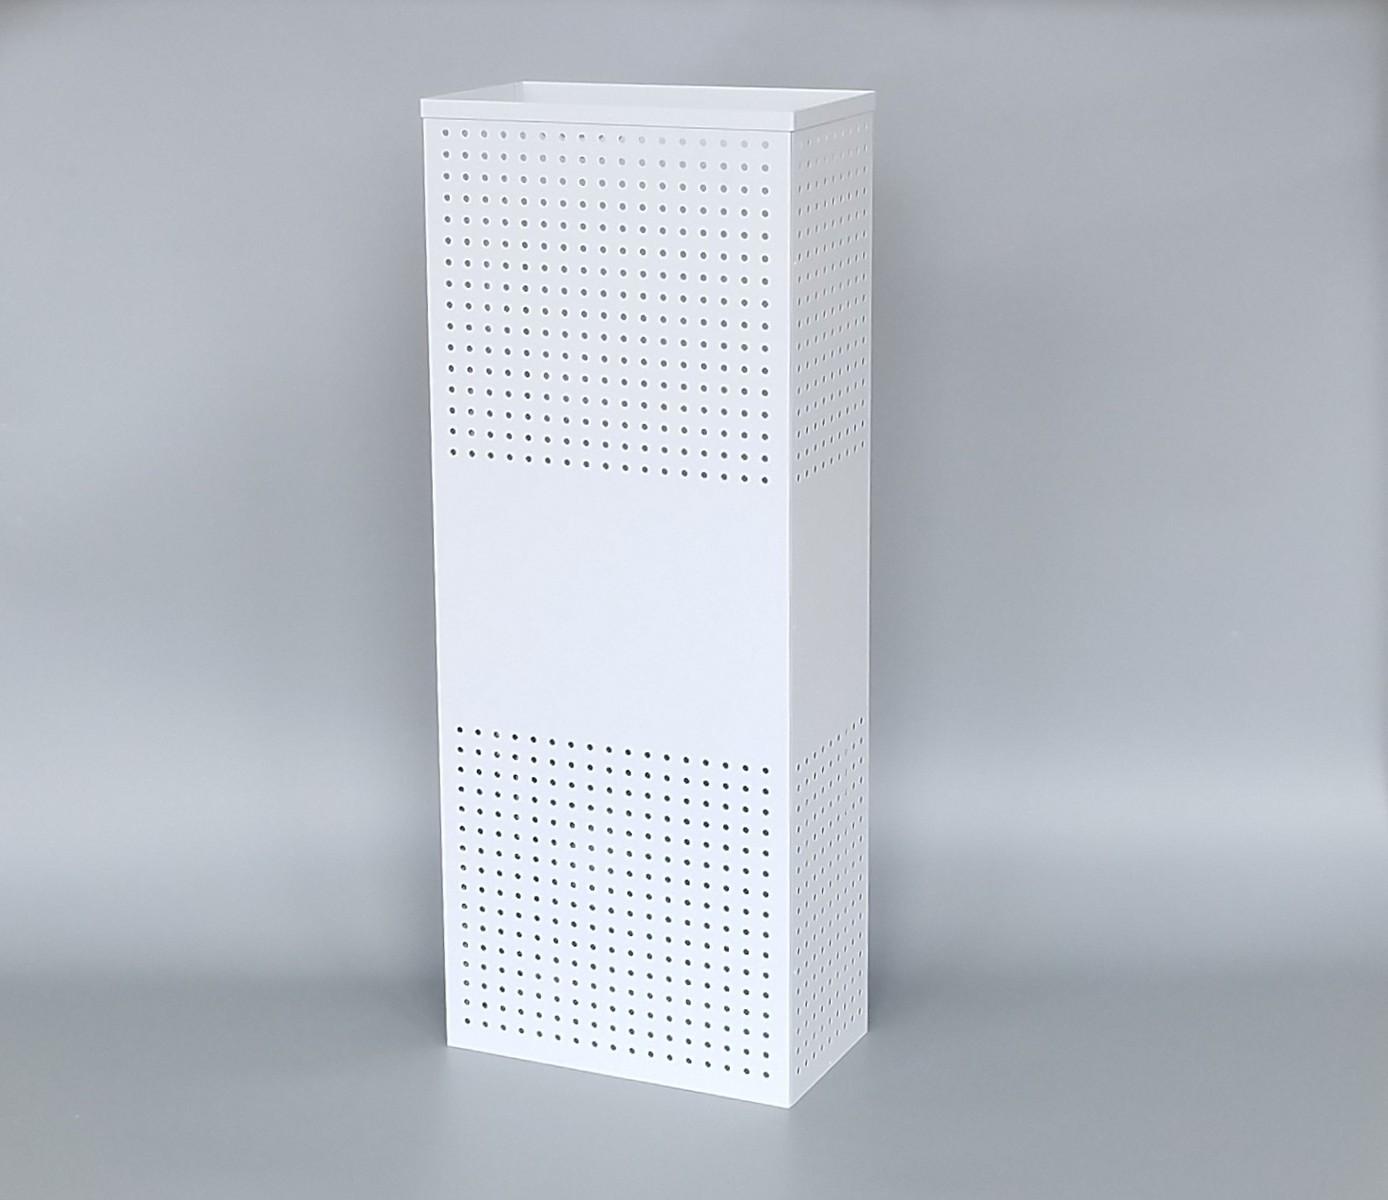 LIENDマルチボックス Mサイズ 玄関ボックス 玄関収納 玄関収納箱 リビング収納 日本製 国産